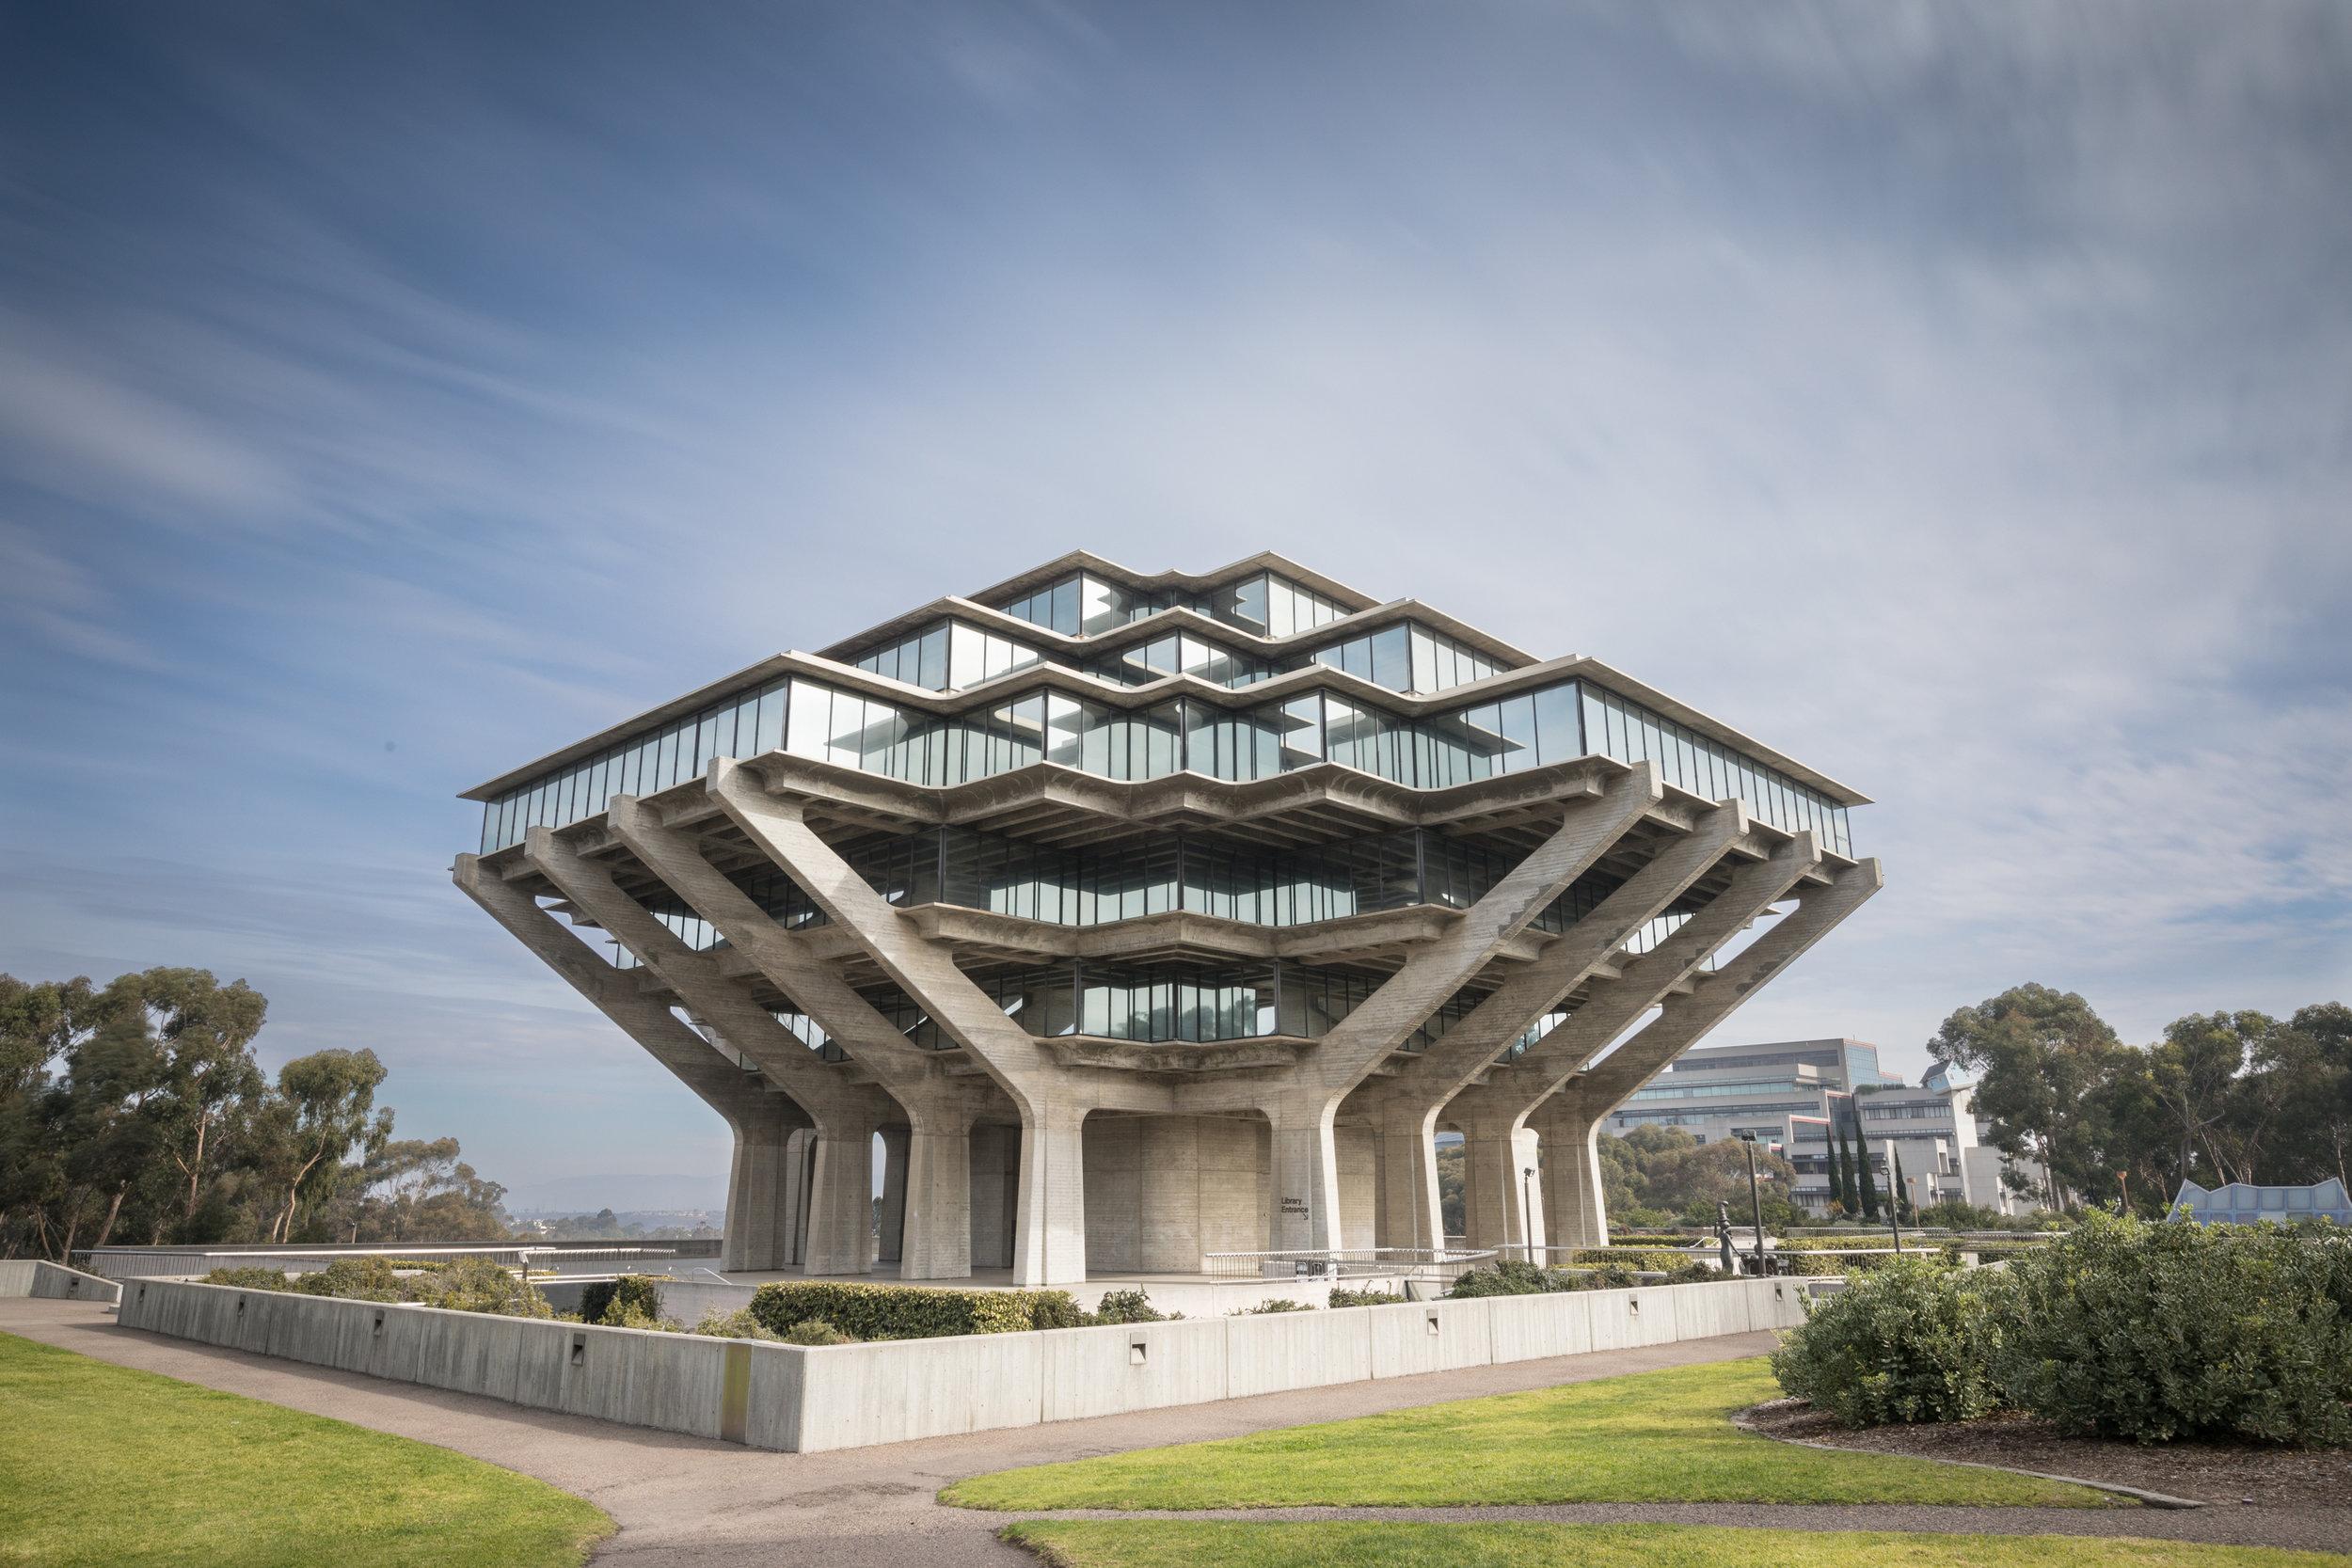 Geisel Library, UC San Diego, San Diego, California [January, 2018]